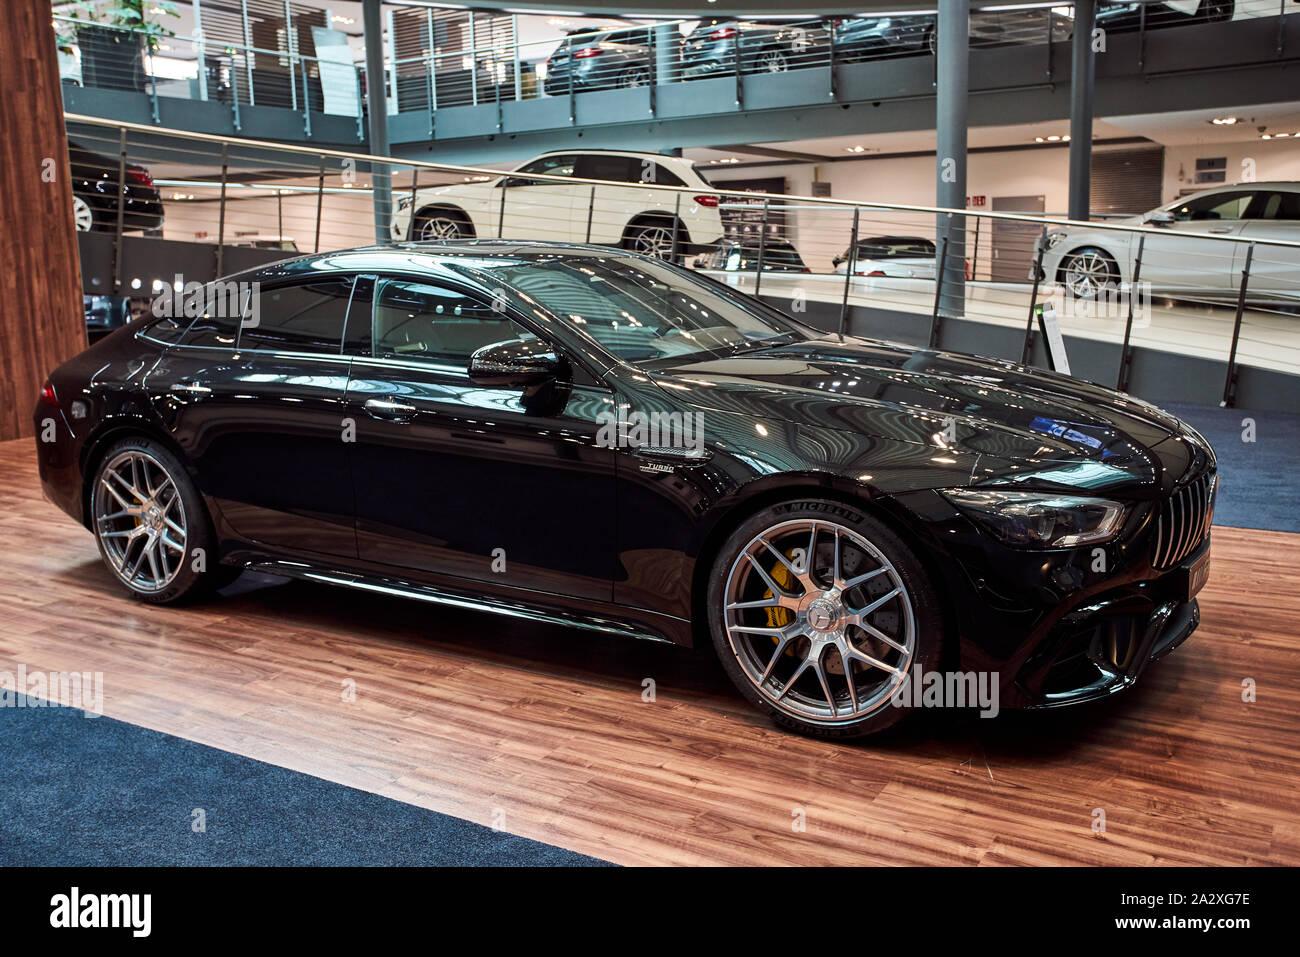 Mercedes Benz Dealers >> Germany Dusseldorf July 17 2019 The New Modern Mercedes